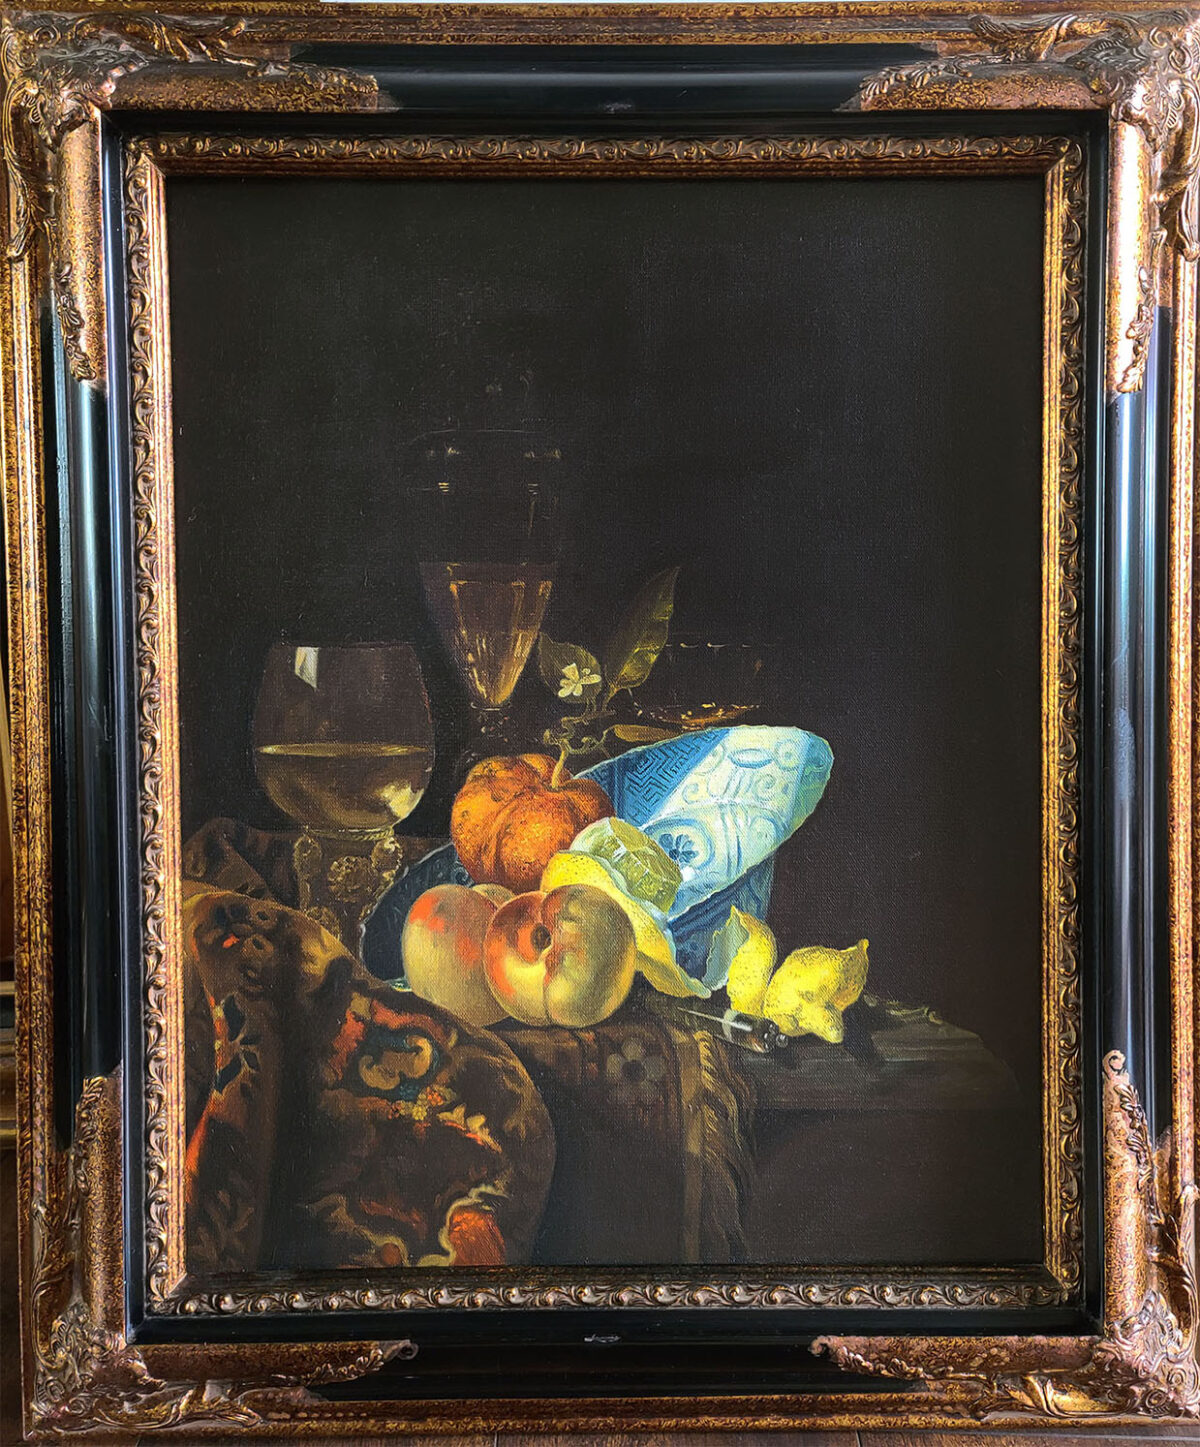 Still Life with Lemons by Tatyana Zen